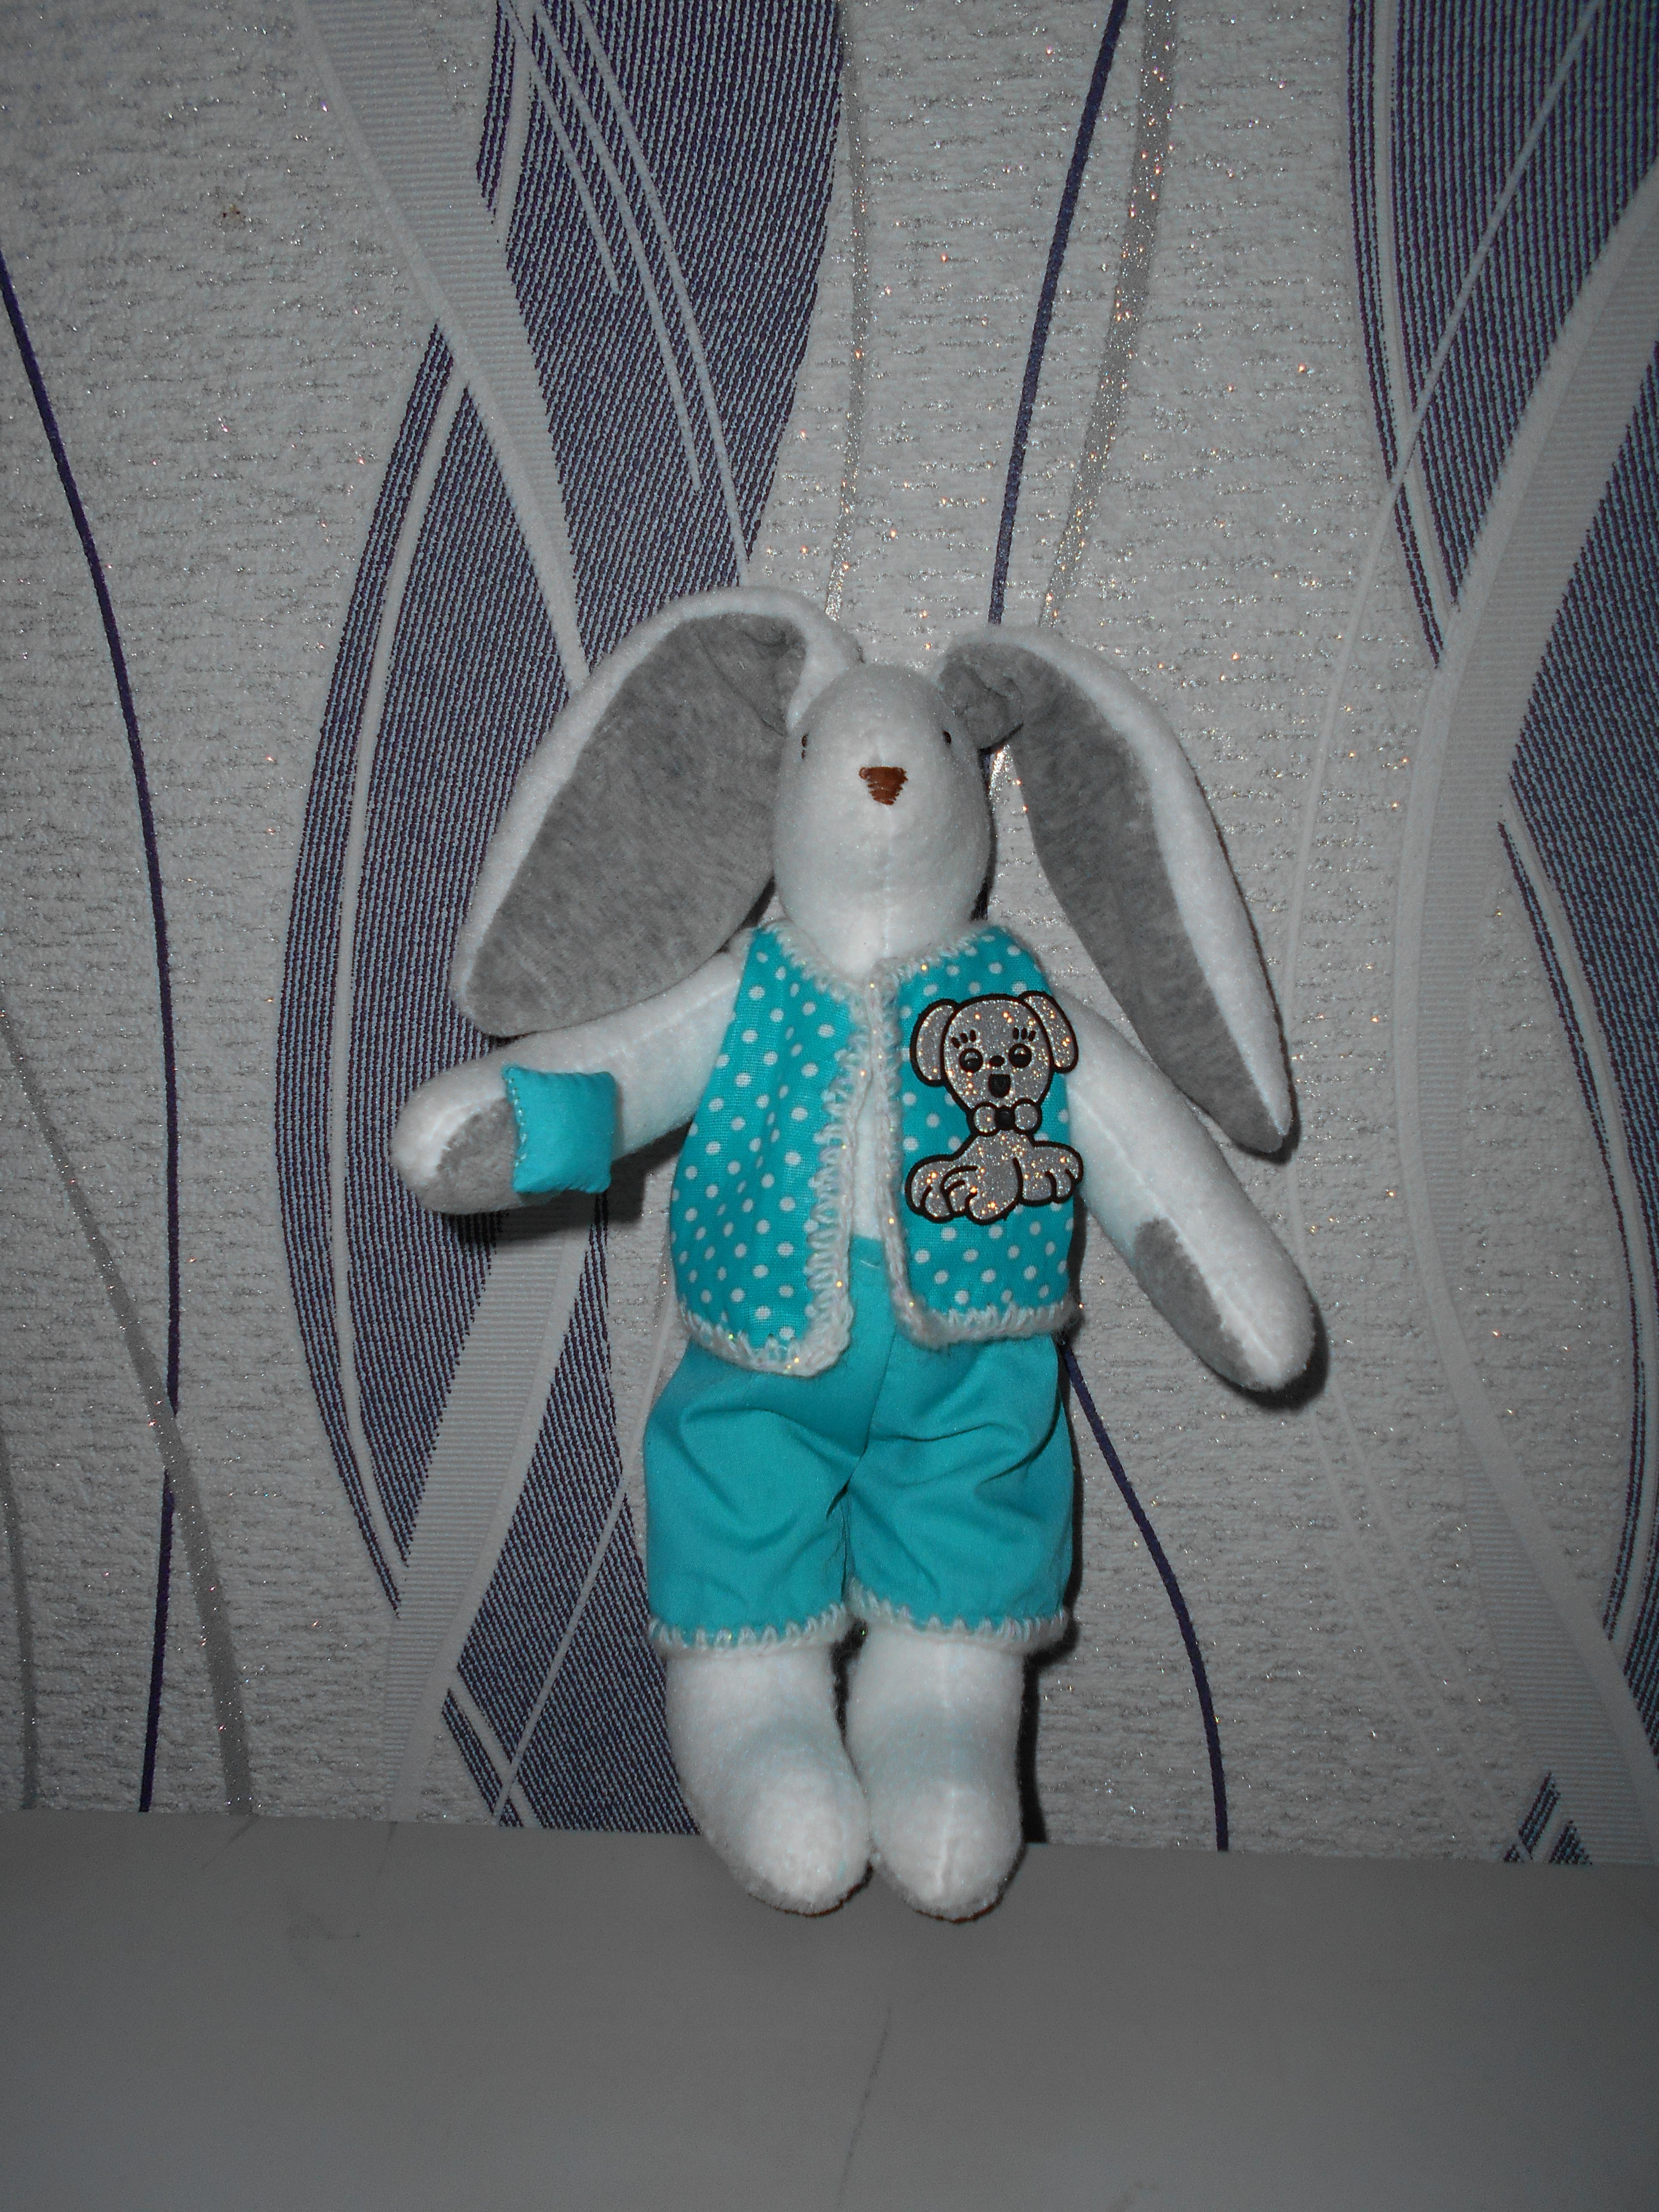 Шитье куклы-тильды: Милашки, куклы тильда выкройки своими руками